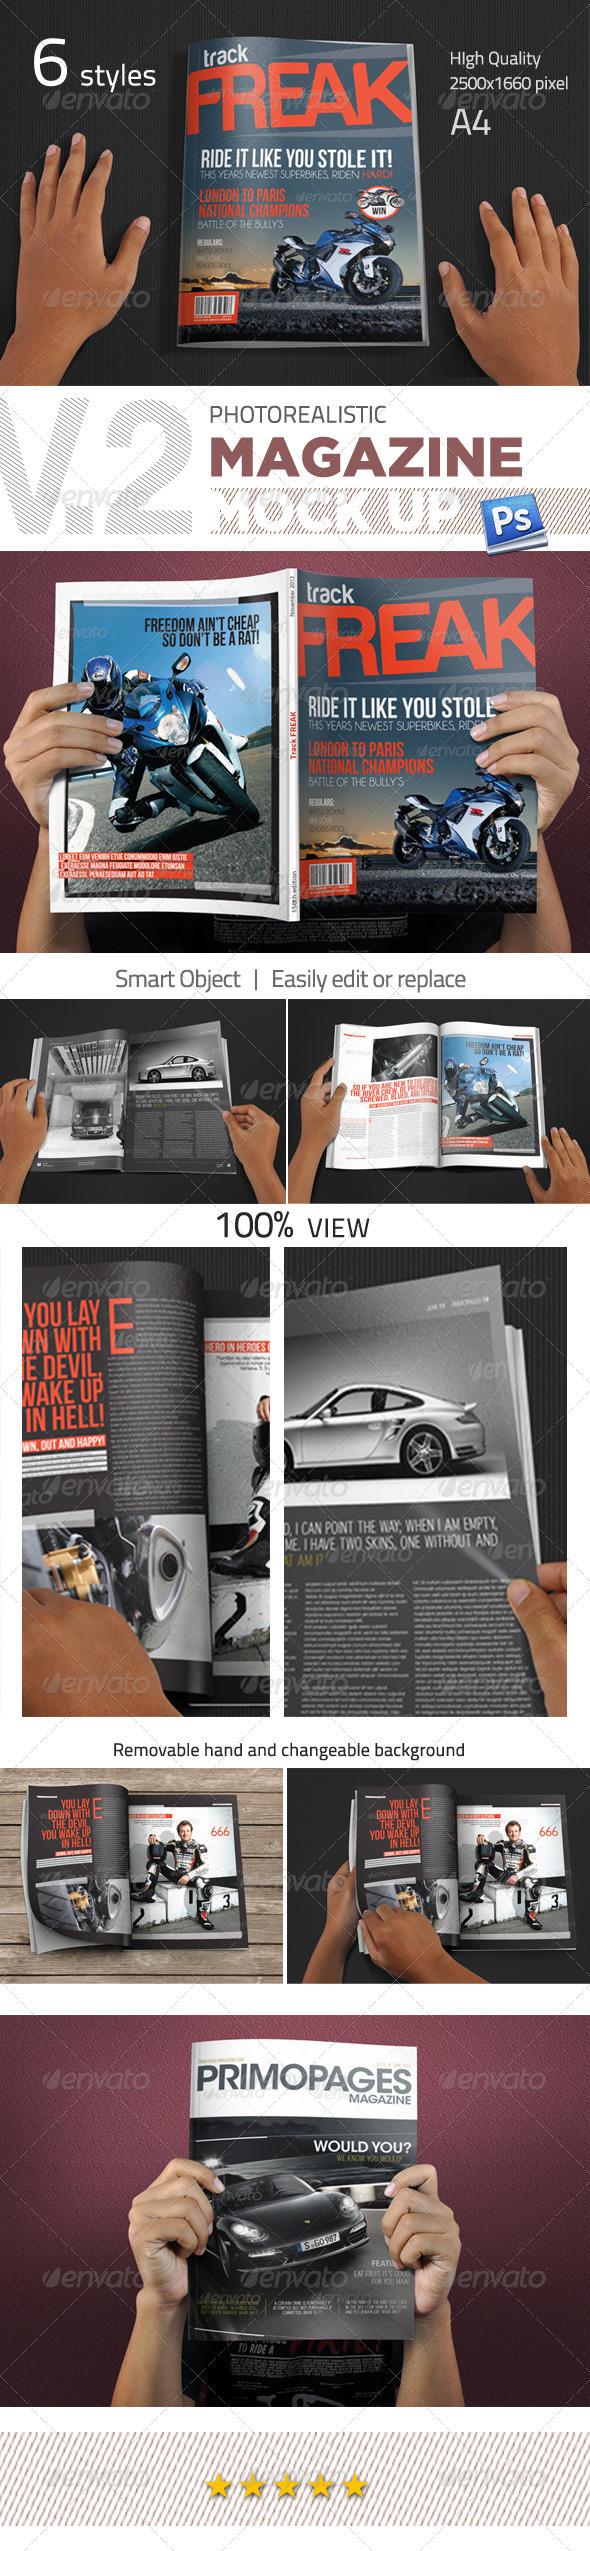 Photorealistic Magazine Mockup V.2 - Magazines Print